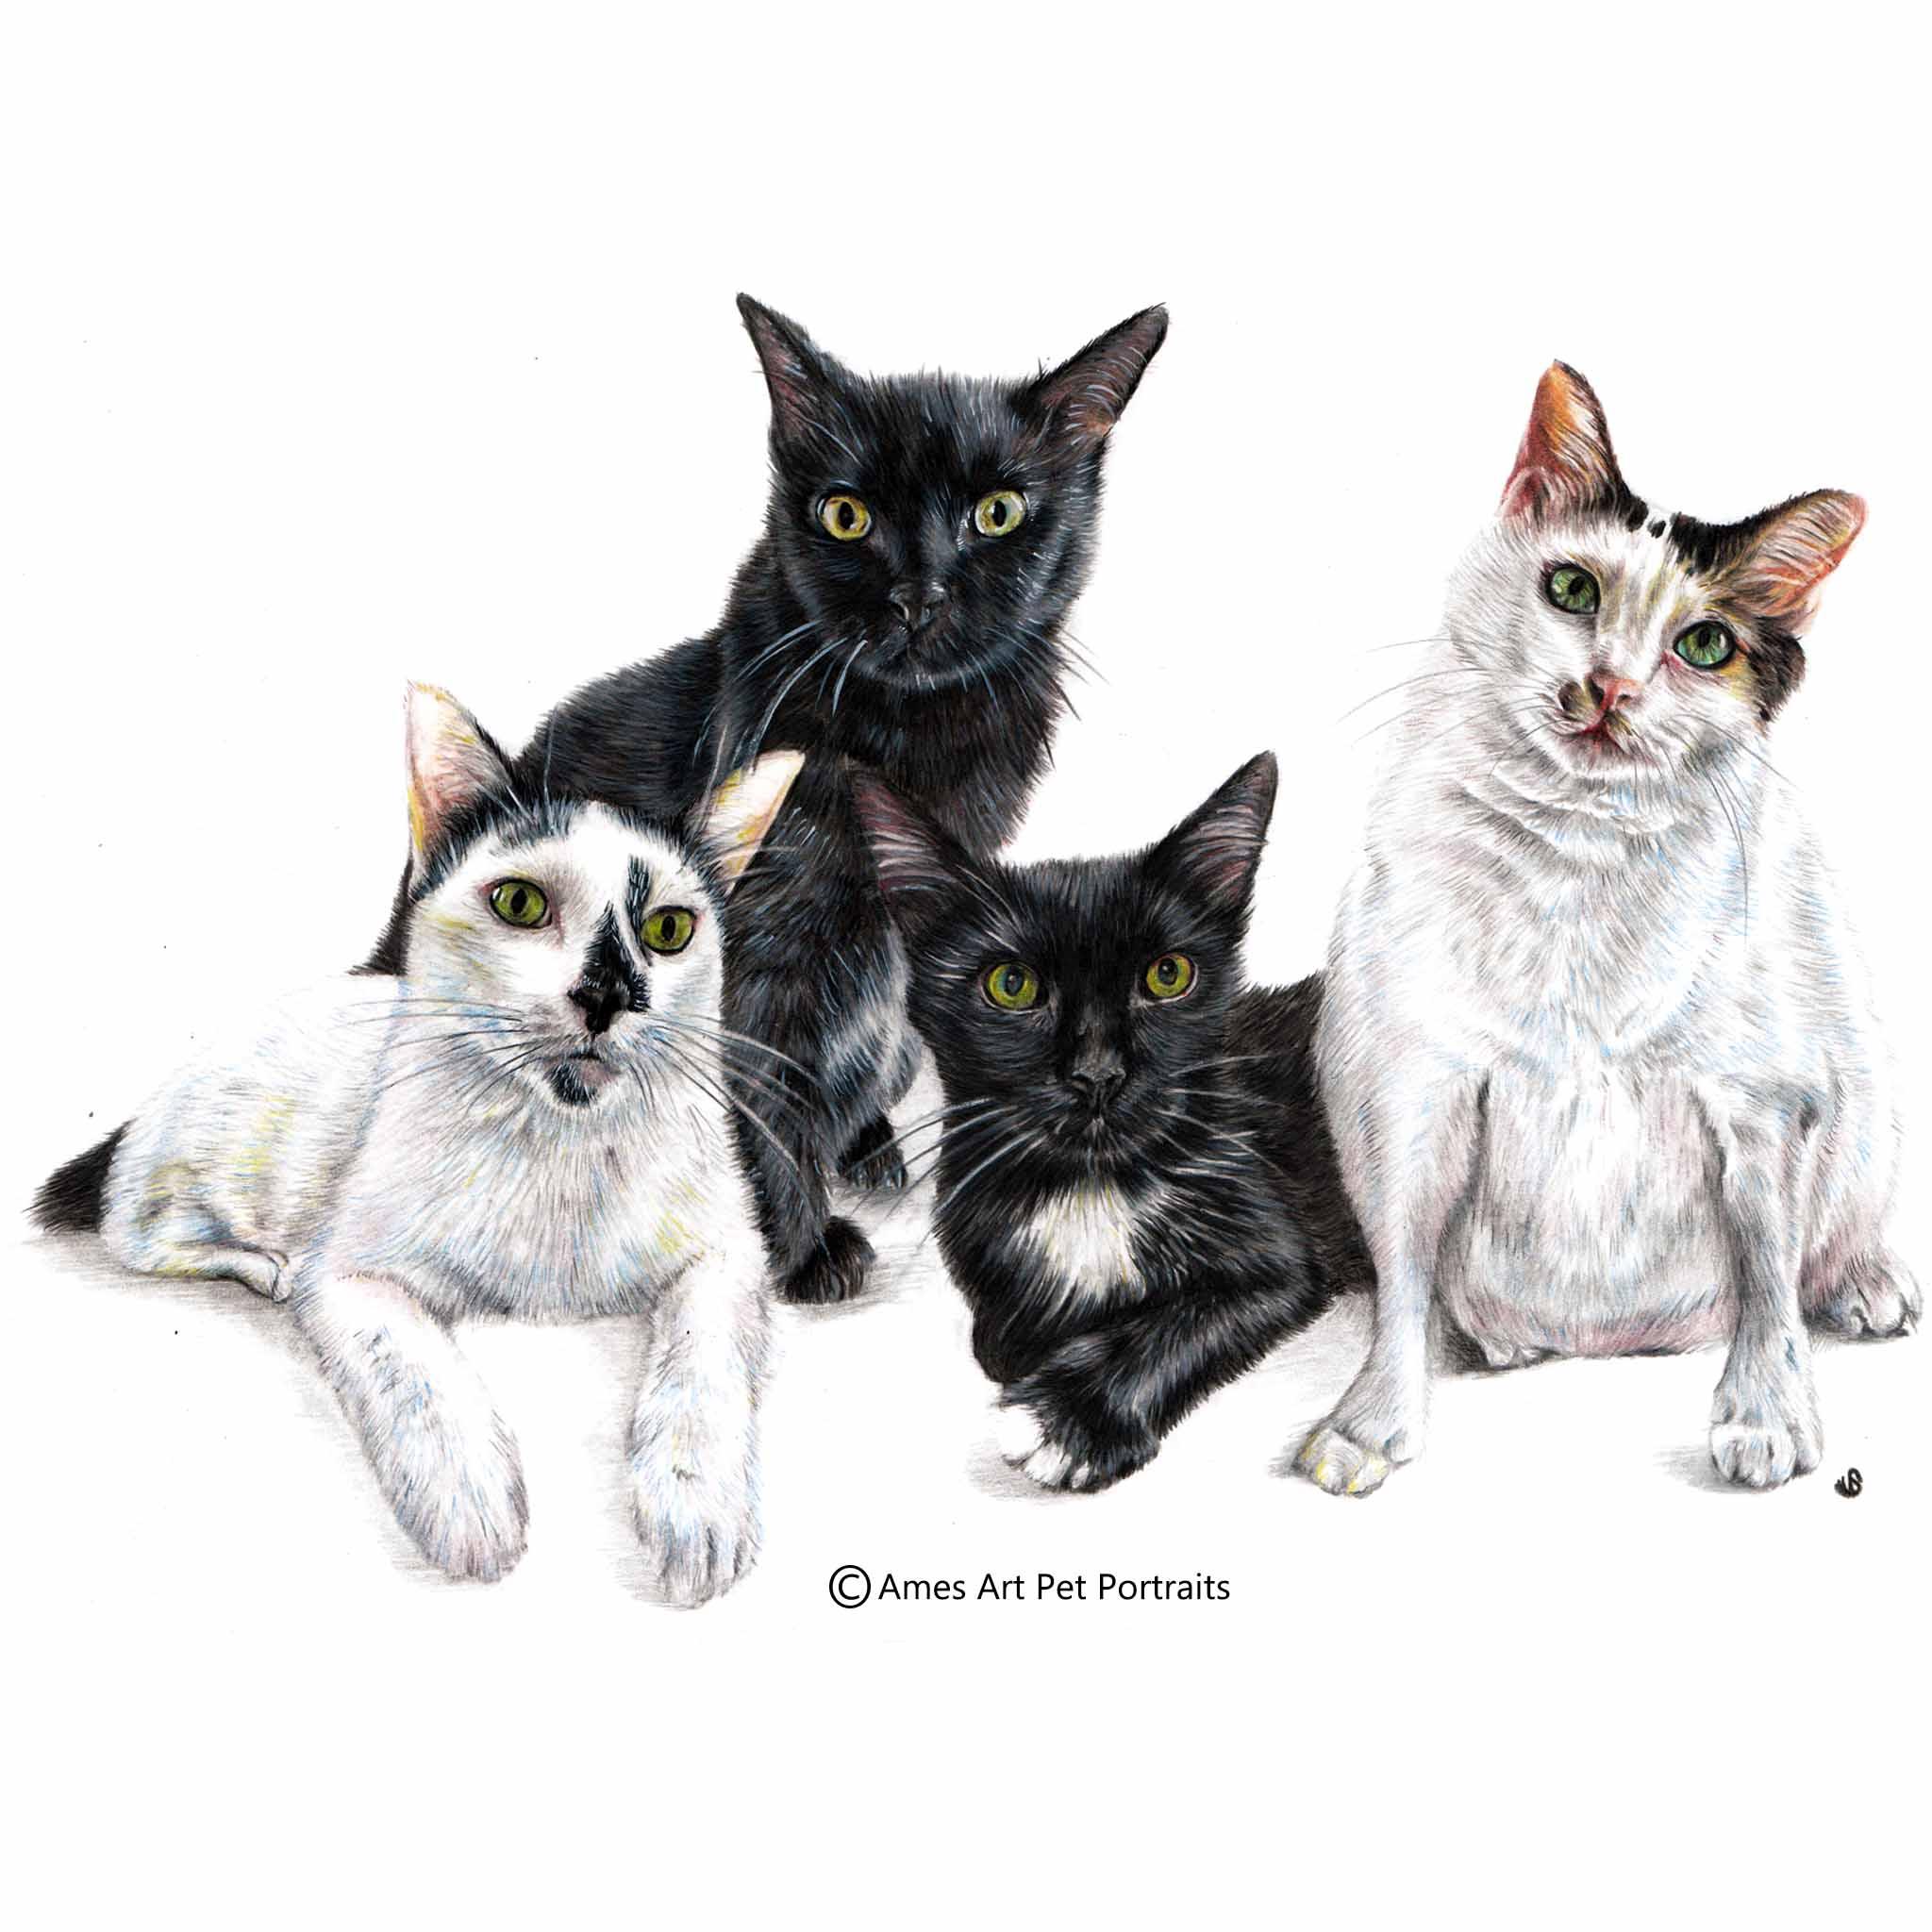 'Stitch, Quiche, Poopies and Oceanz' - Singapore, 11.7 x 16.5 in, 2017, Colour Pencil Cat Portrait